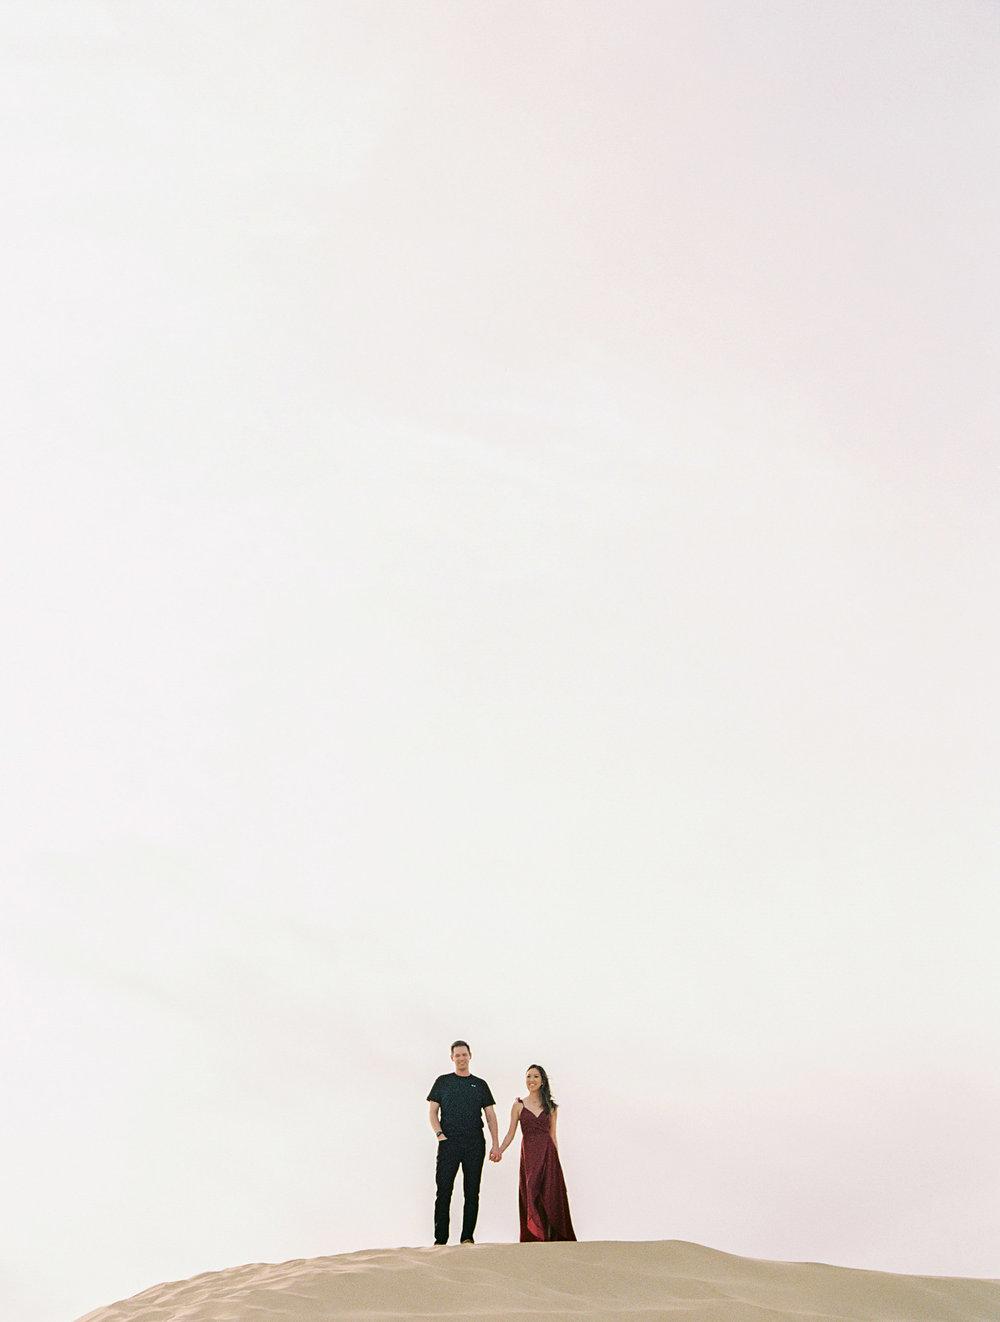 46CHRISTINEANDJOSH_SANDDUNES_ENGAGEMENT_SALLYPINERAPHOTOGRAPHY_-131.jpg